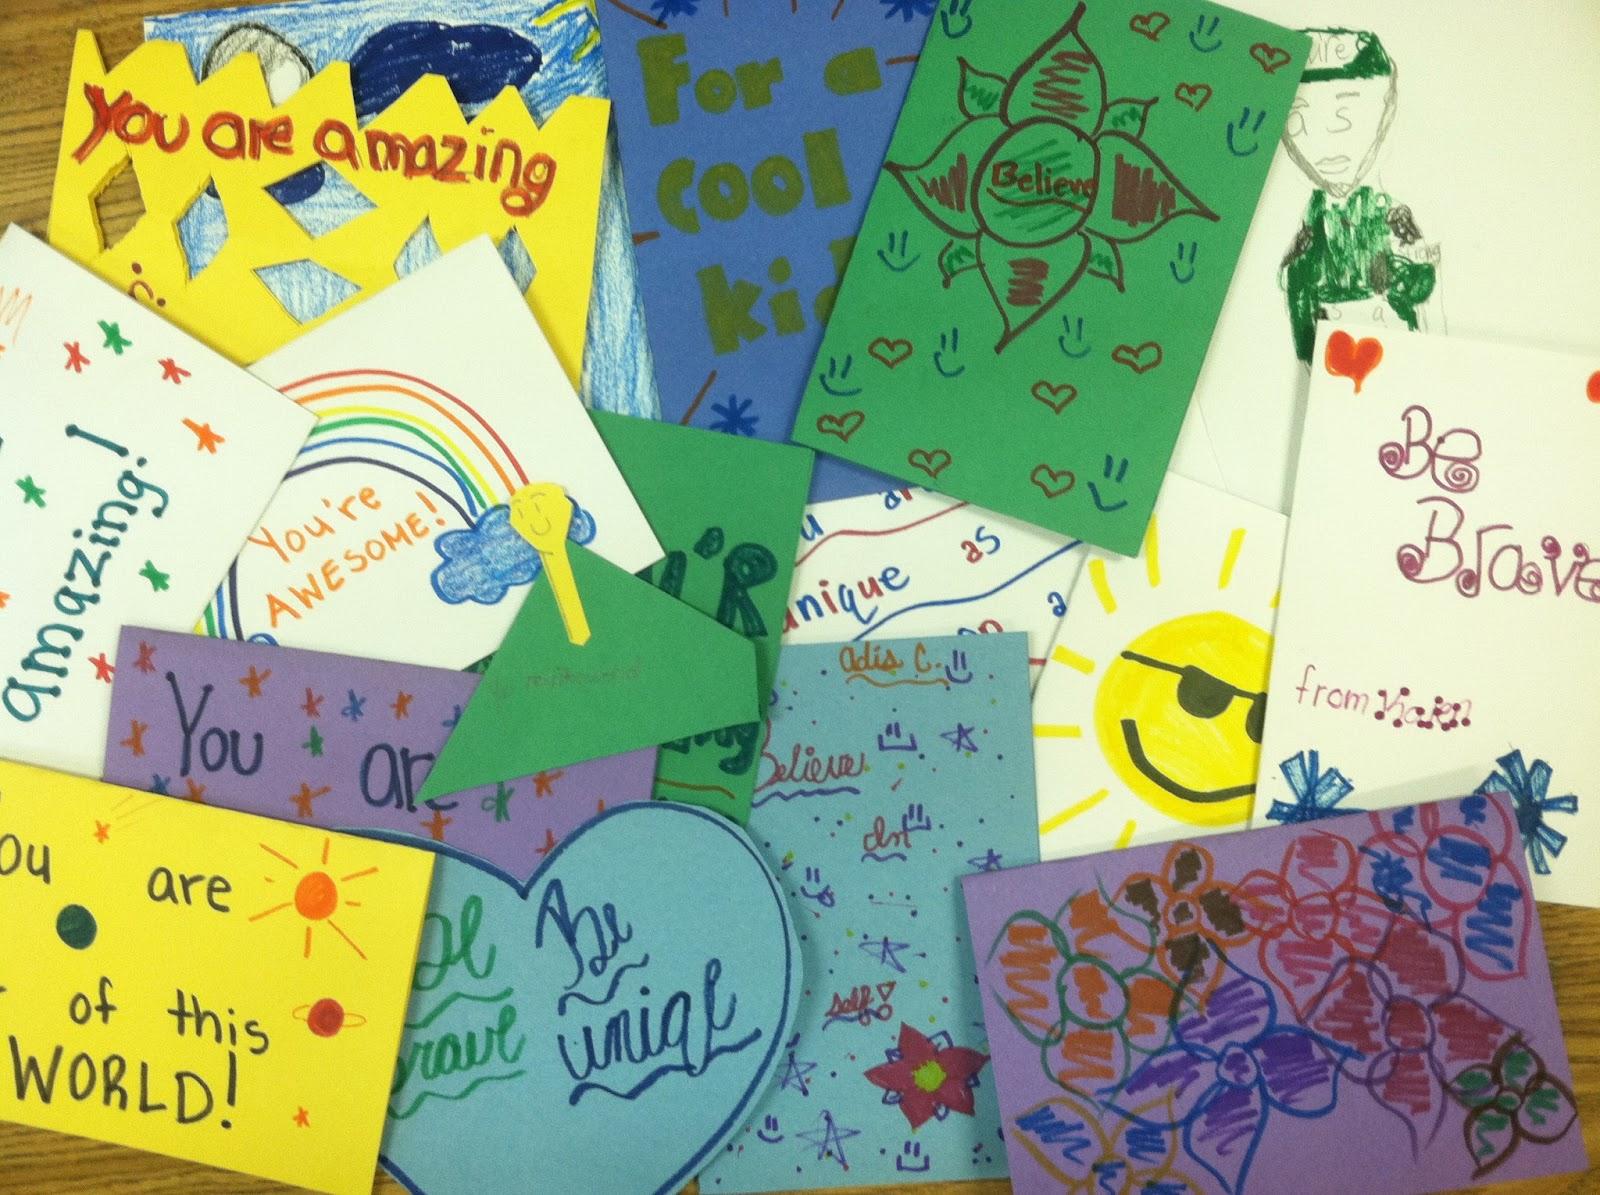 Lattes & Laughter: Cards for Hospitalized Children